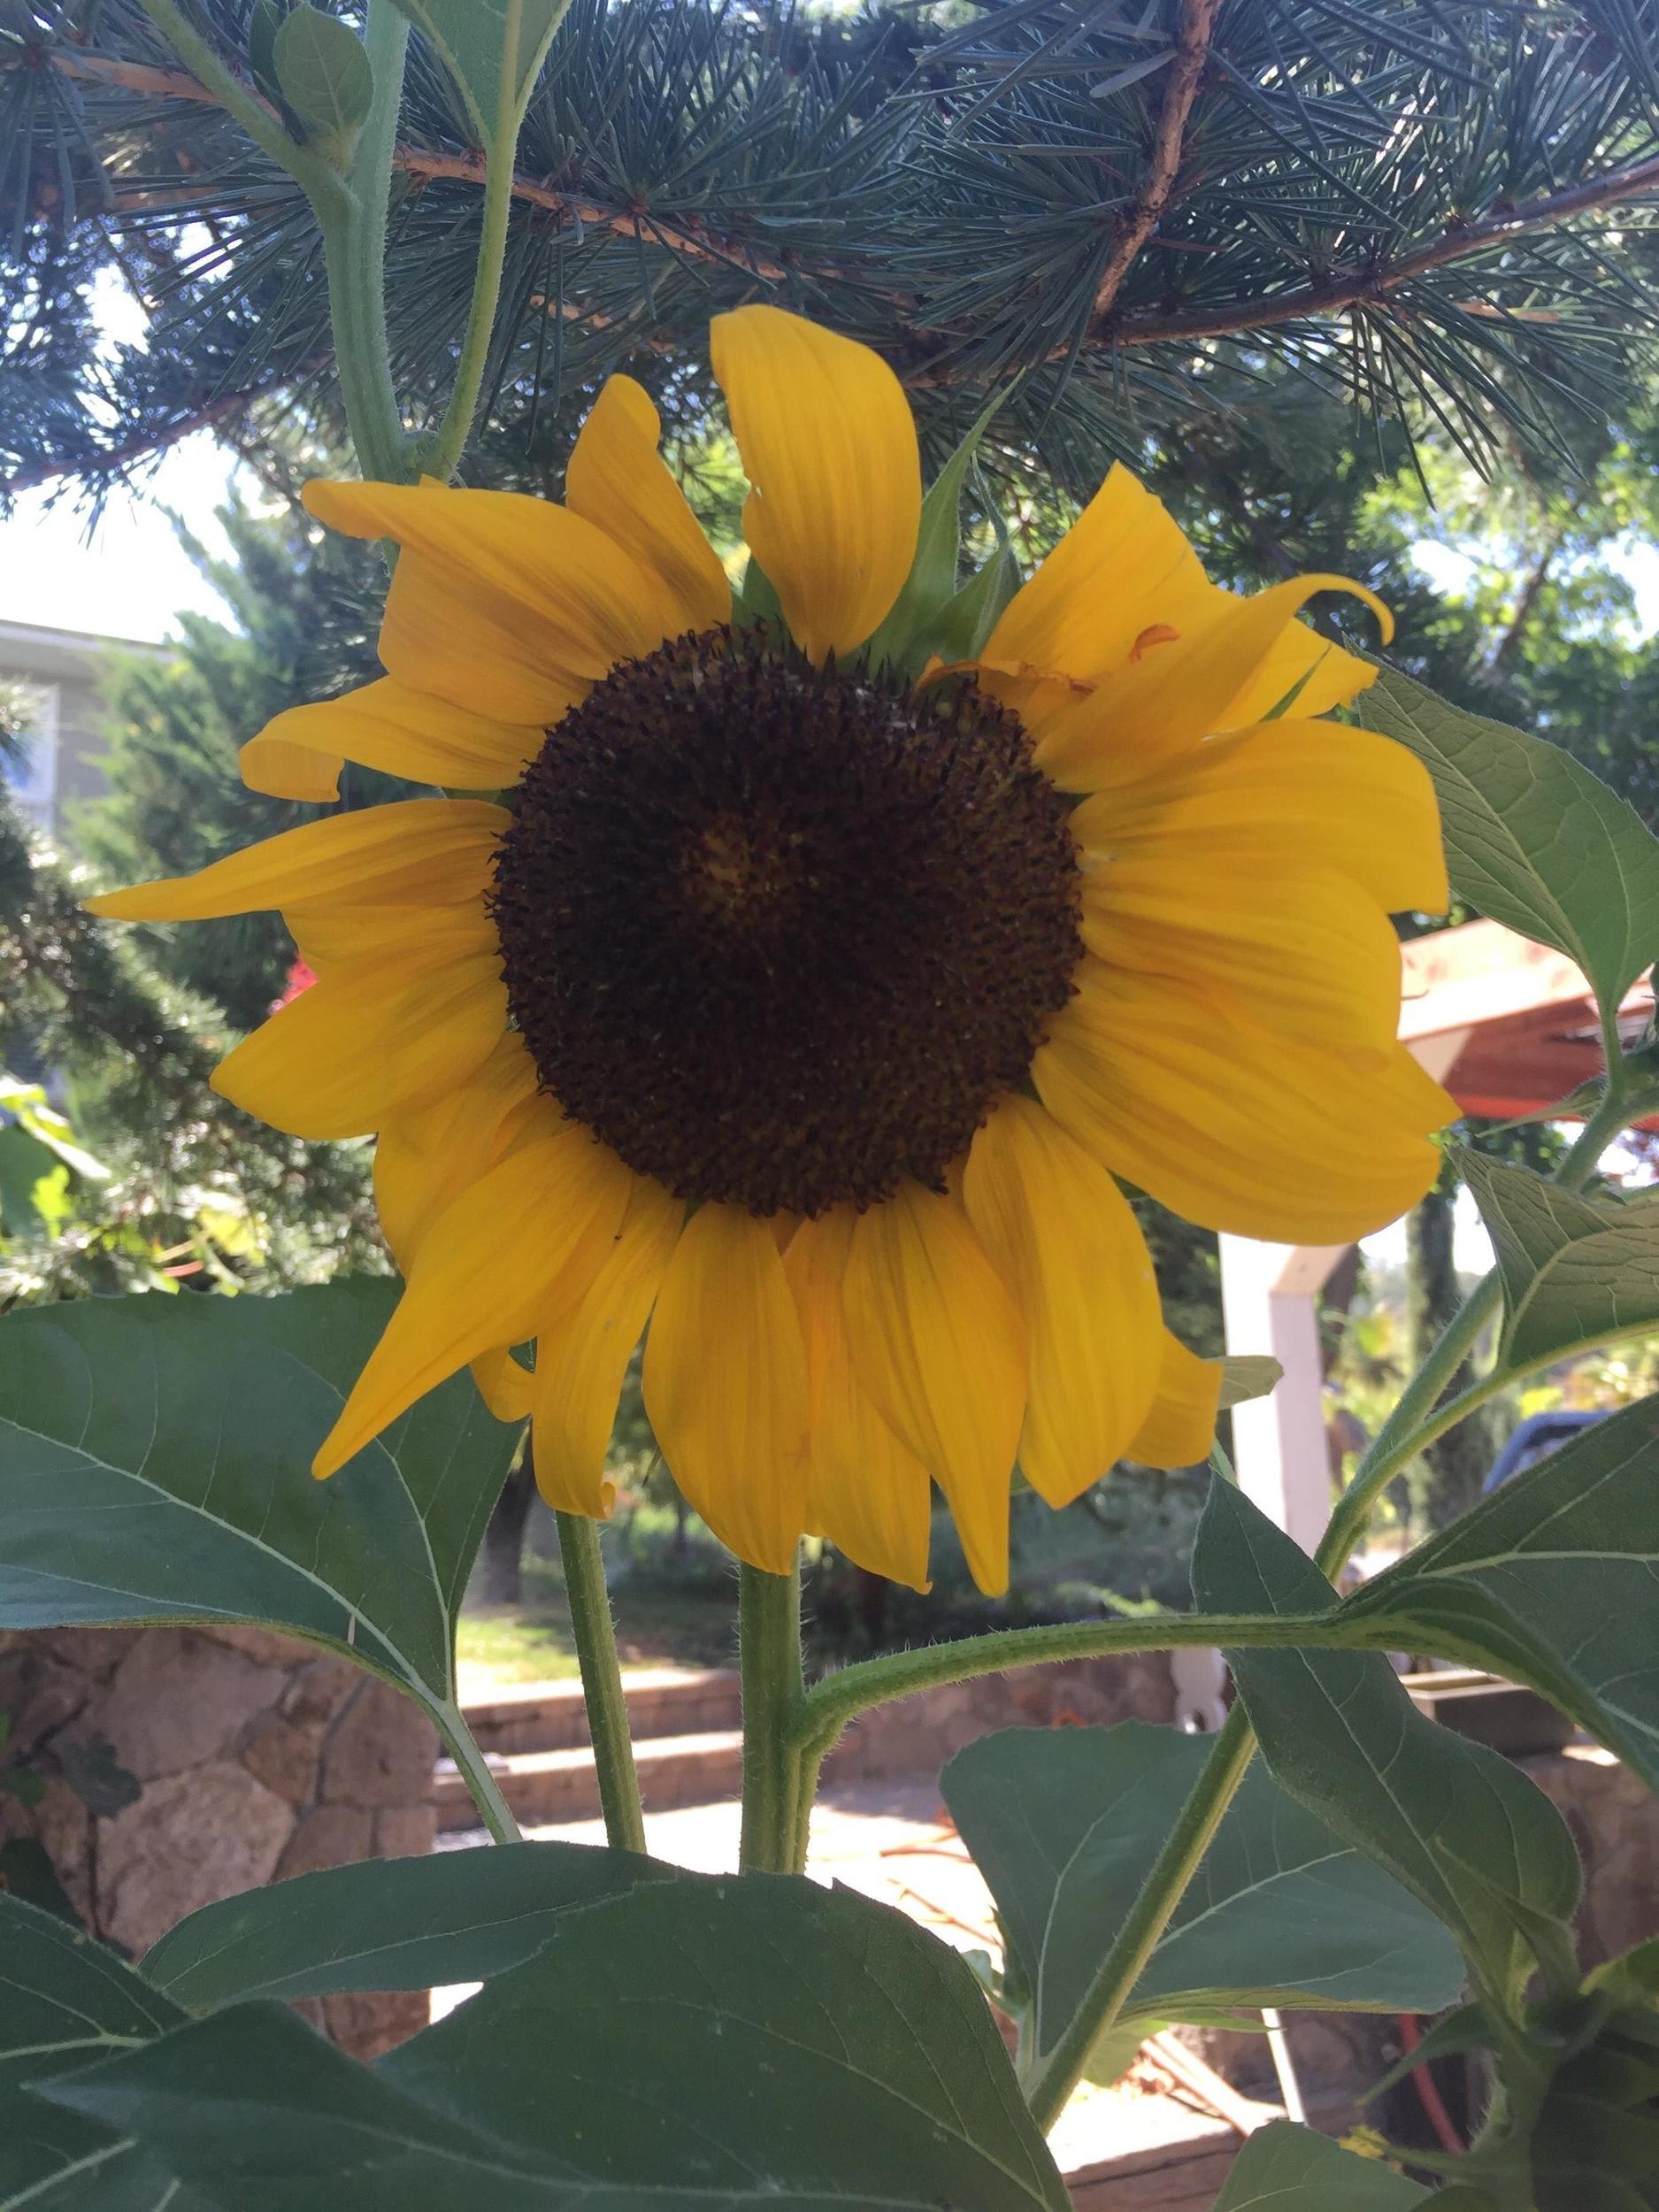 Gratus_Vineyards_sunflower.jpg